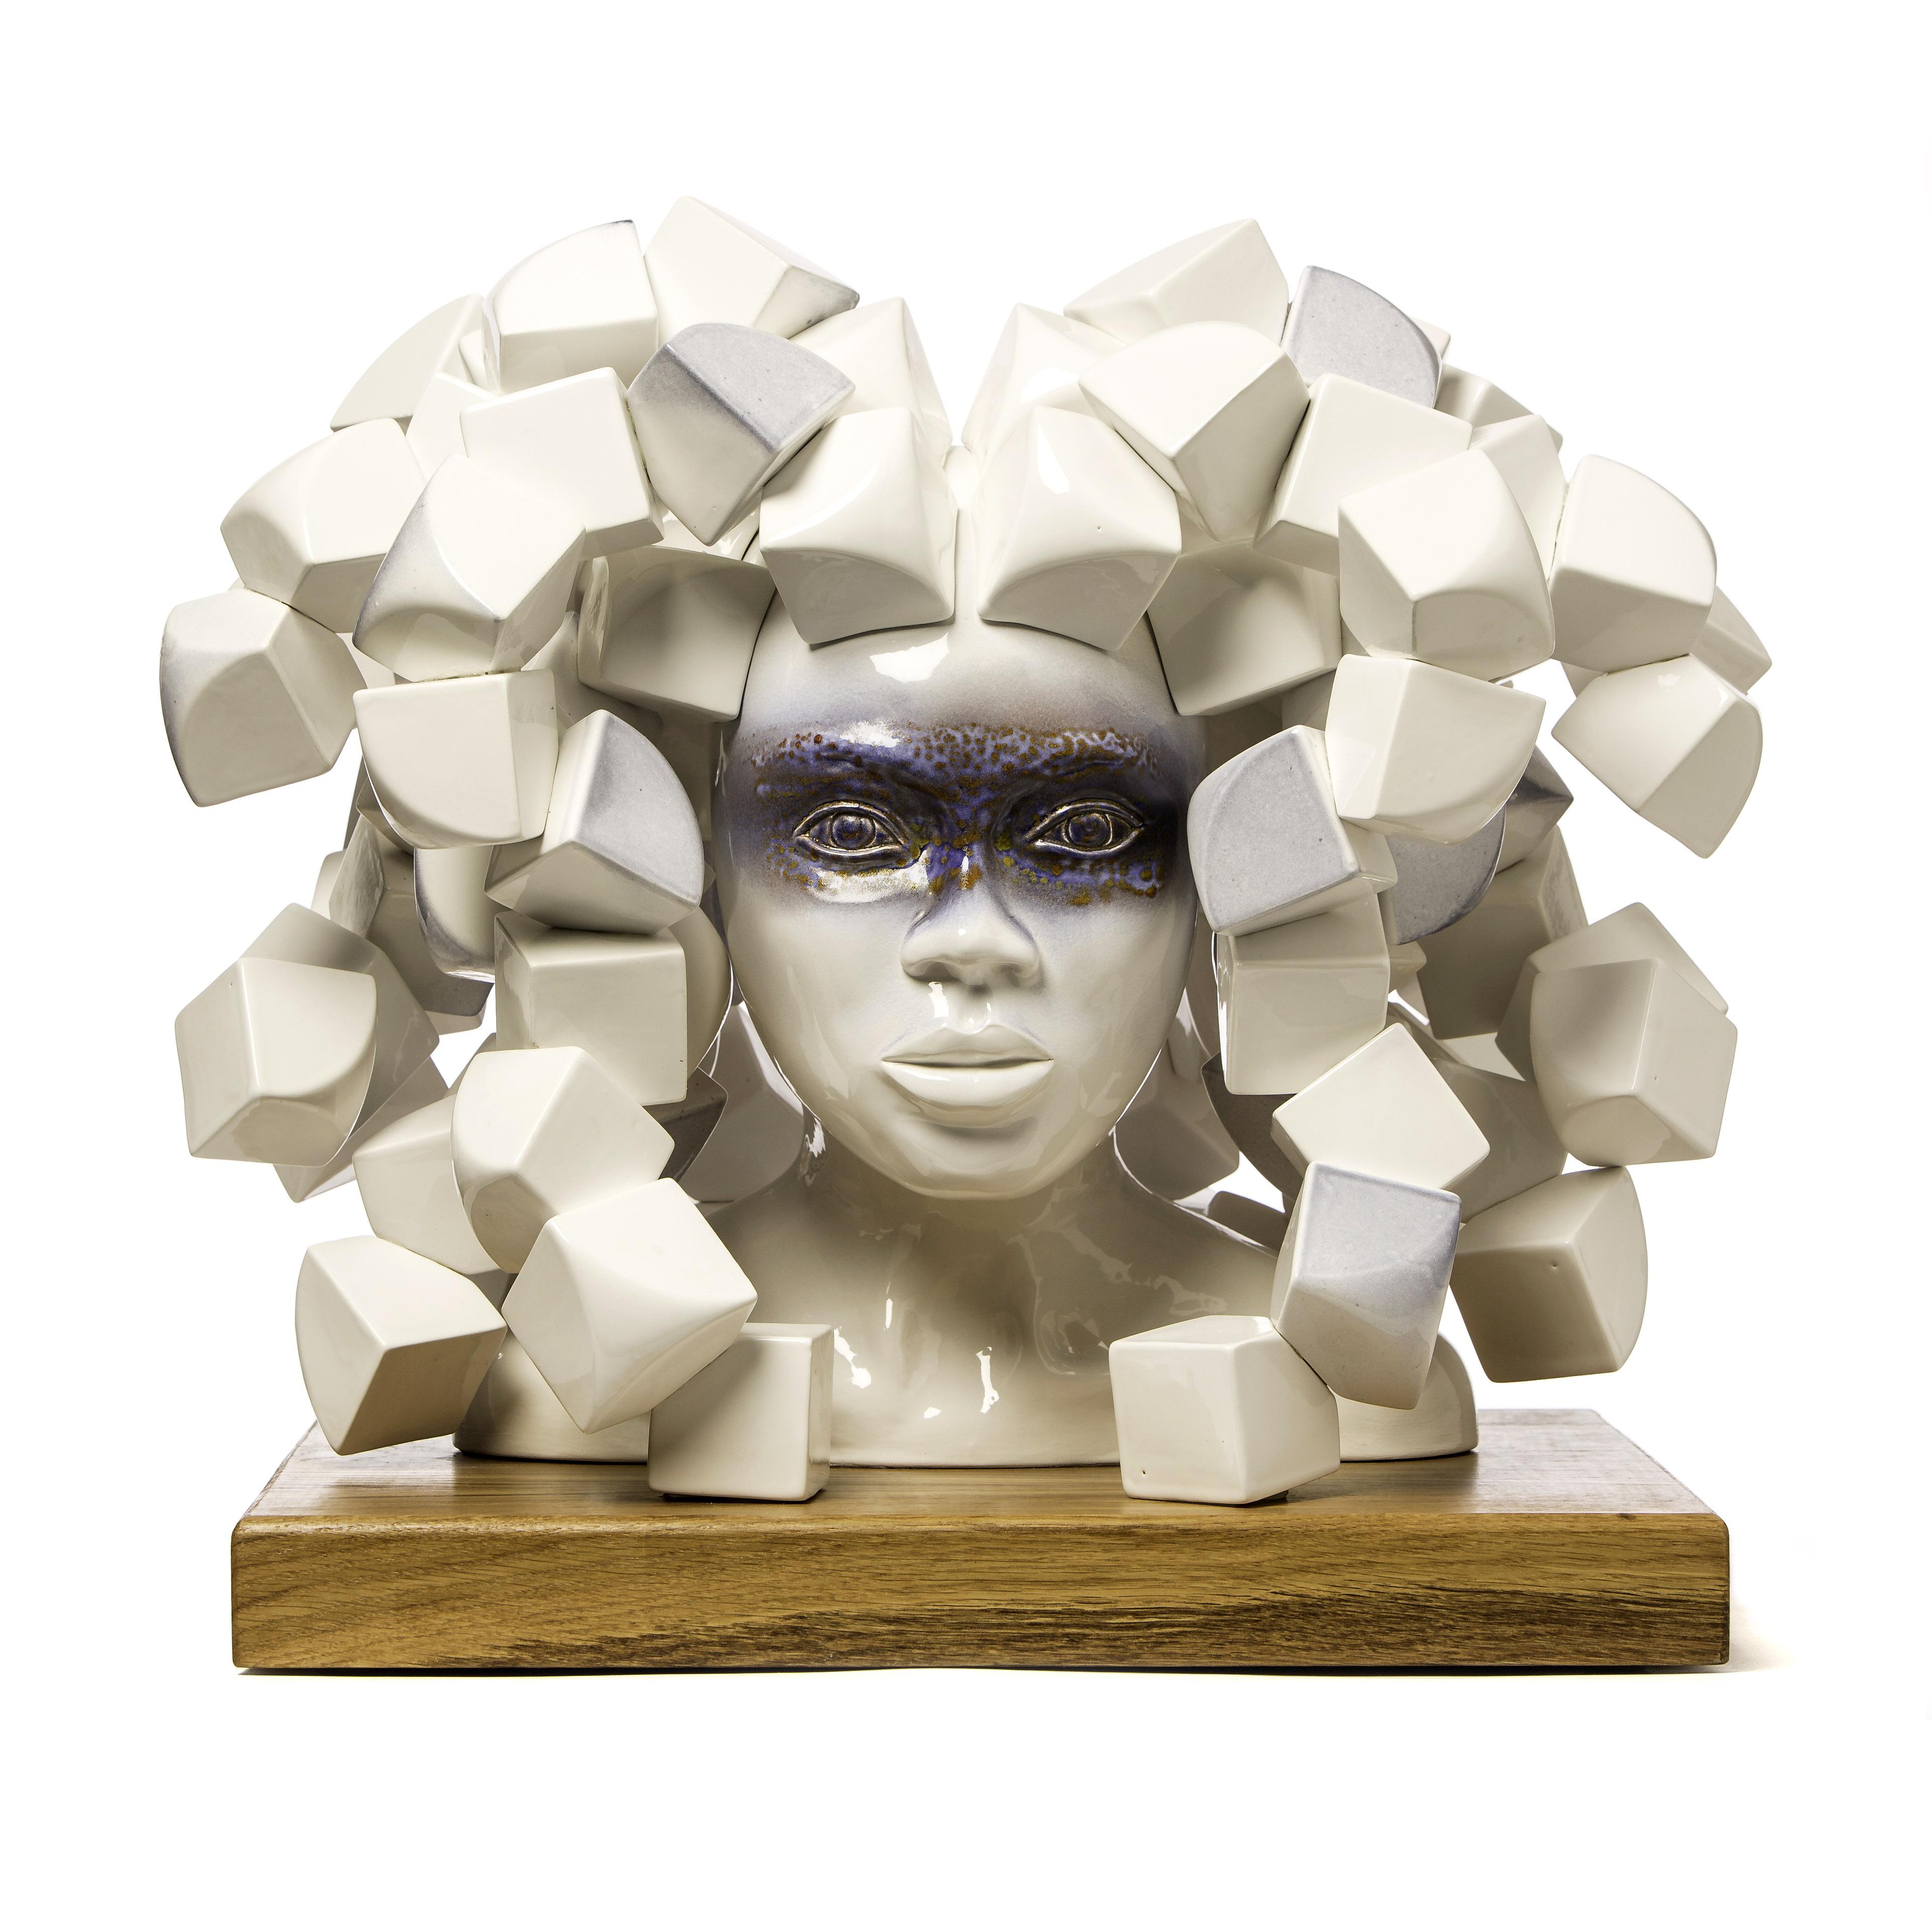 david-millidge-rene-white-cubes-1280x1280